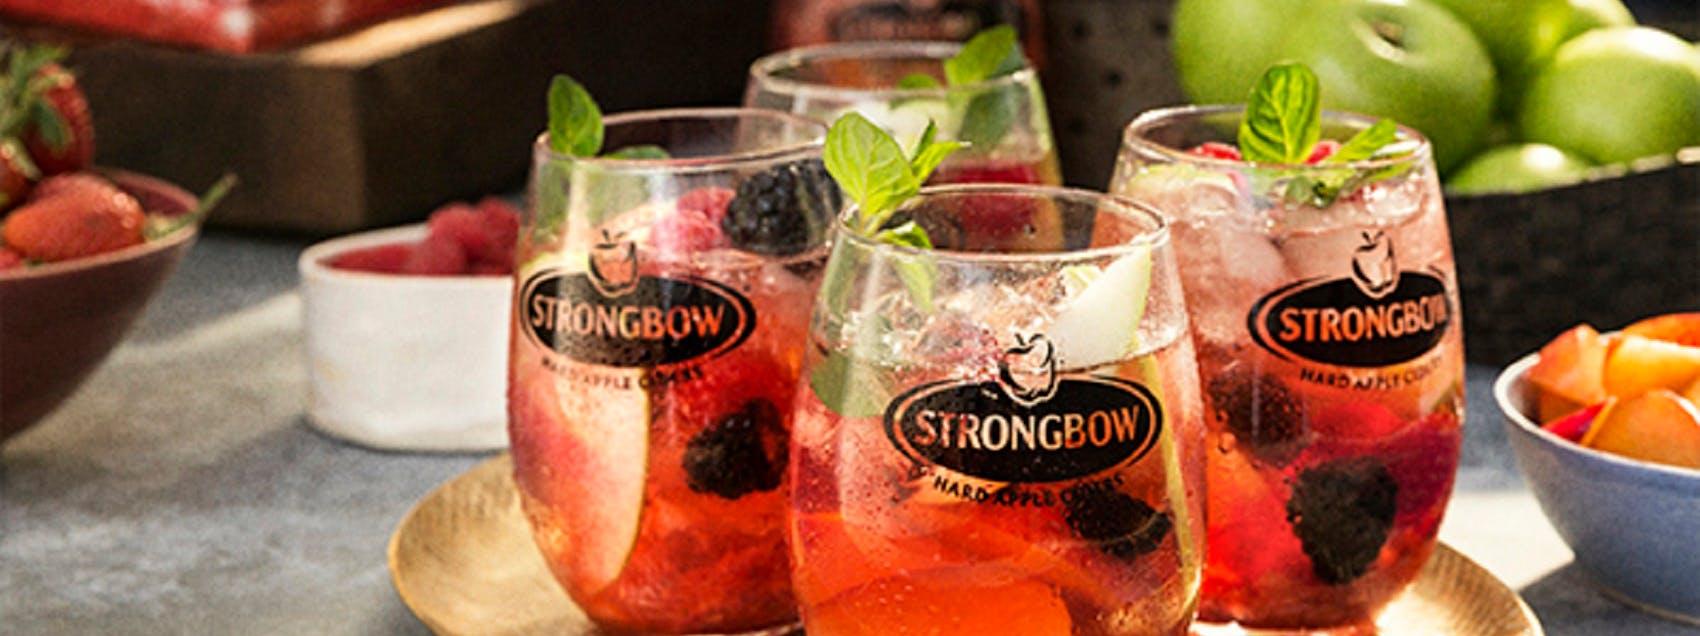 Strongbow Cherry Blossom Sangria